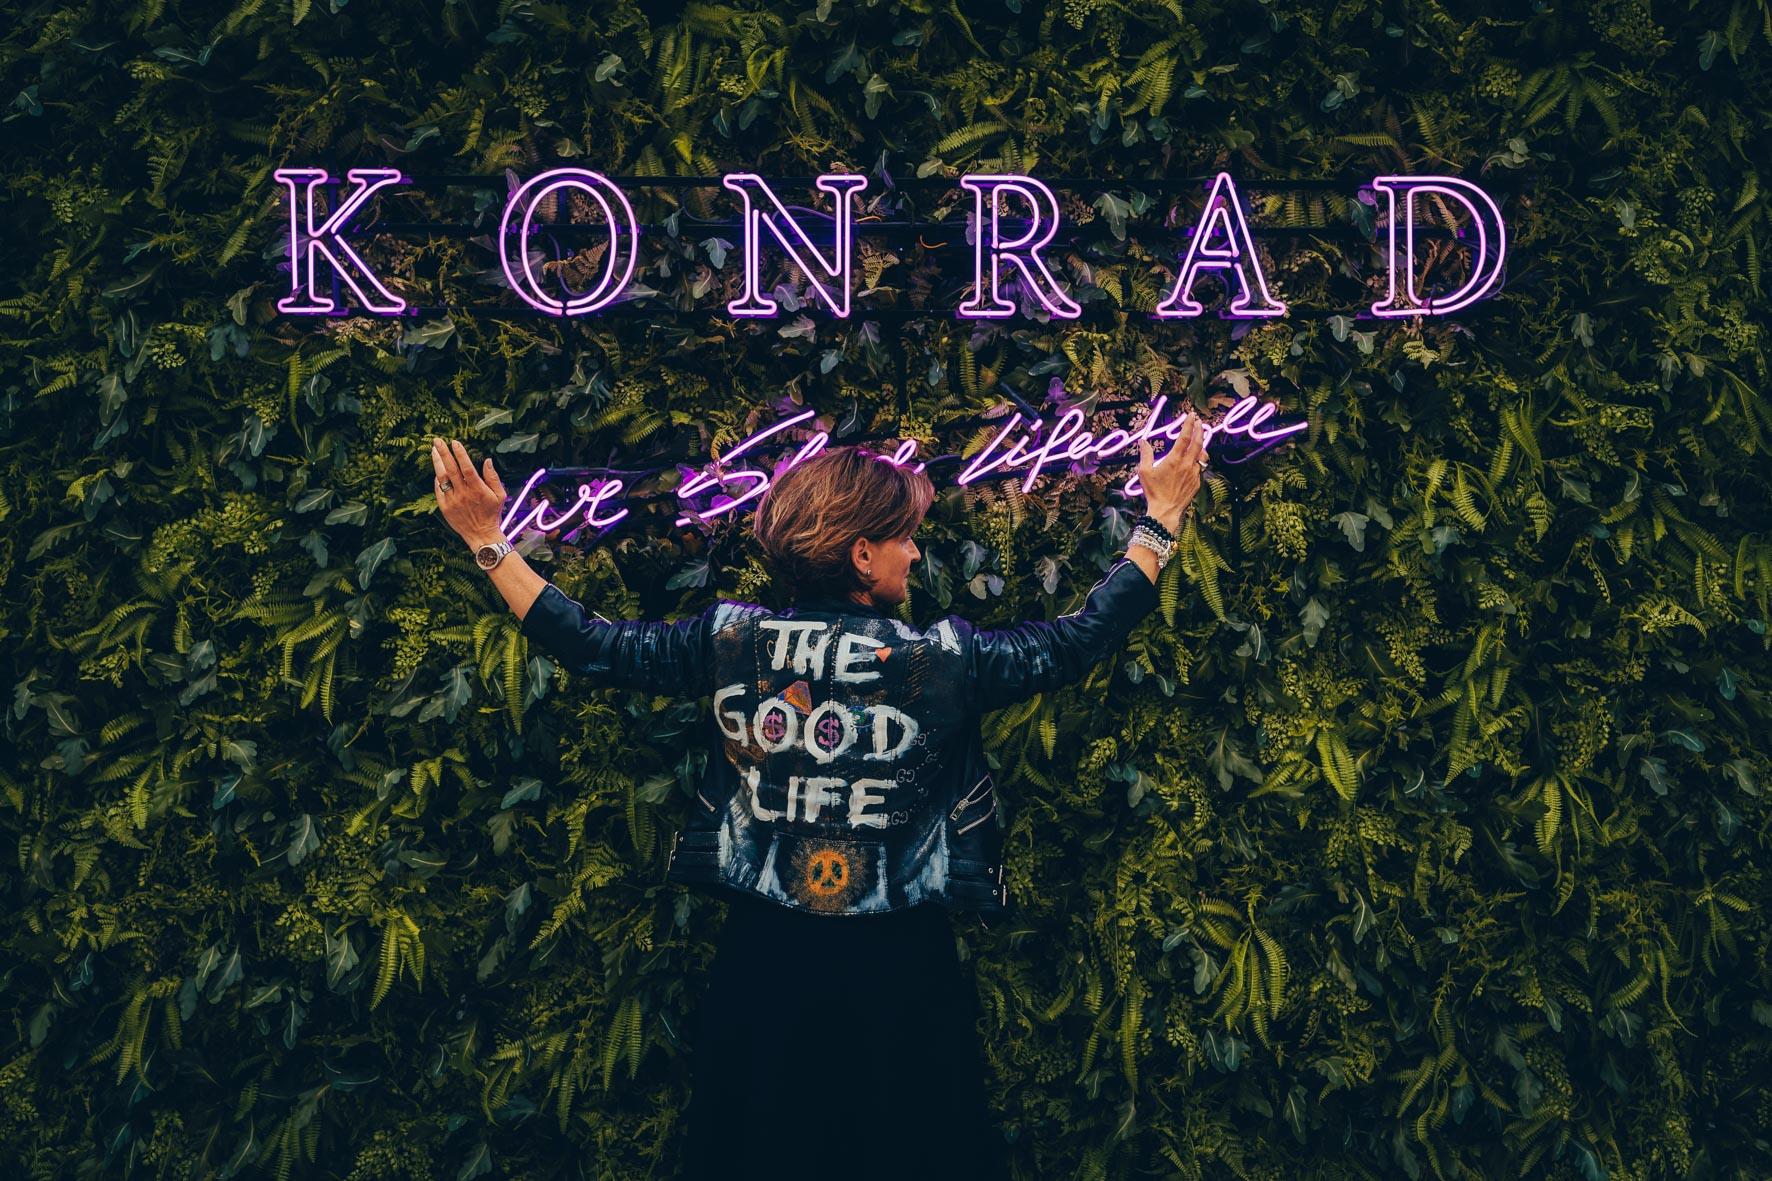 Konrad-lifestyle-art-basel-%22grand-party%22-2019-2.jpg